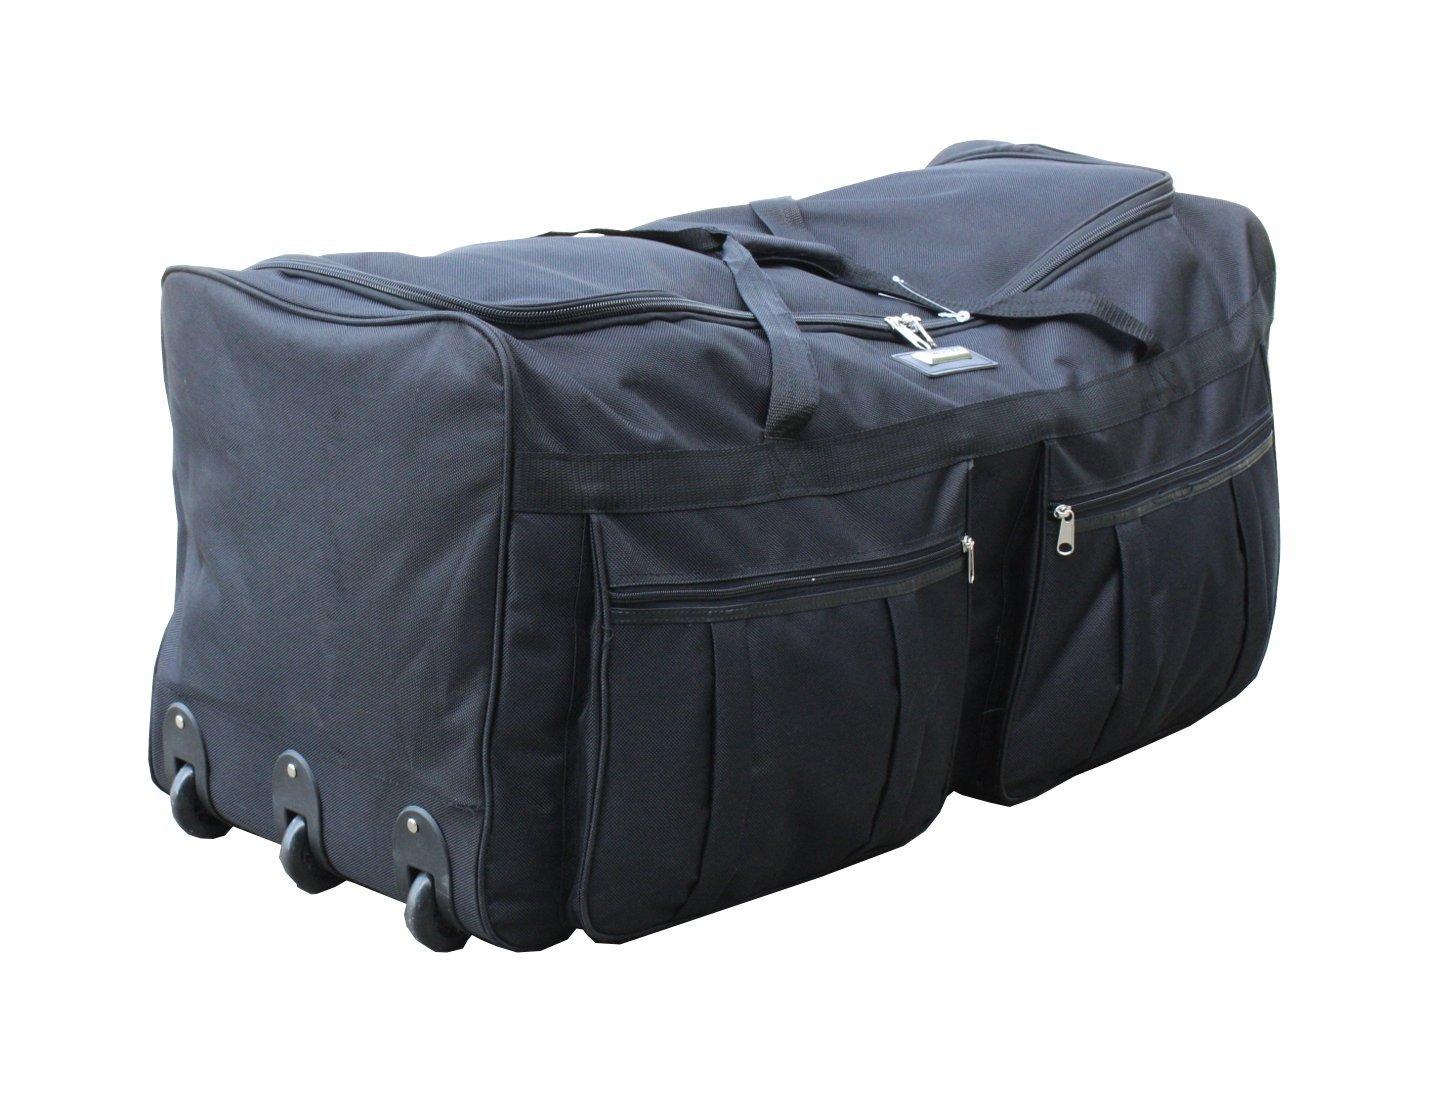 7295115f2d7 Filson Extra Large Rolling Duffle Bag Tan Sportique